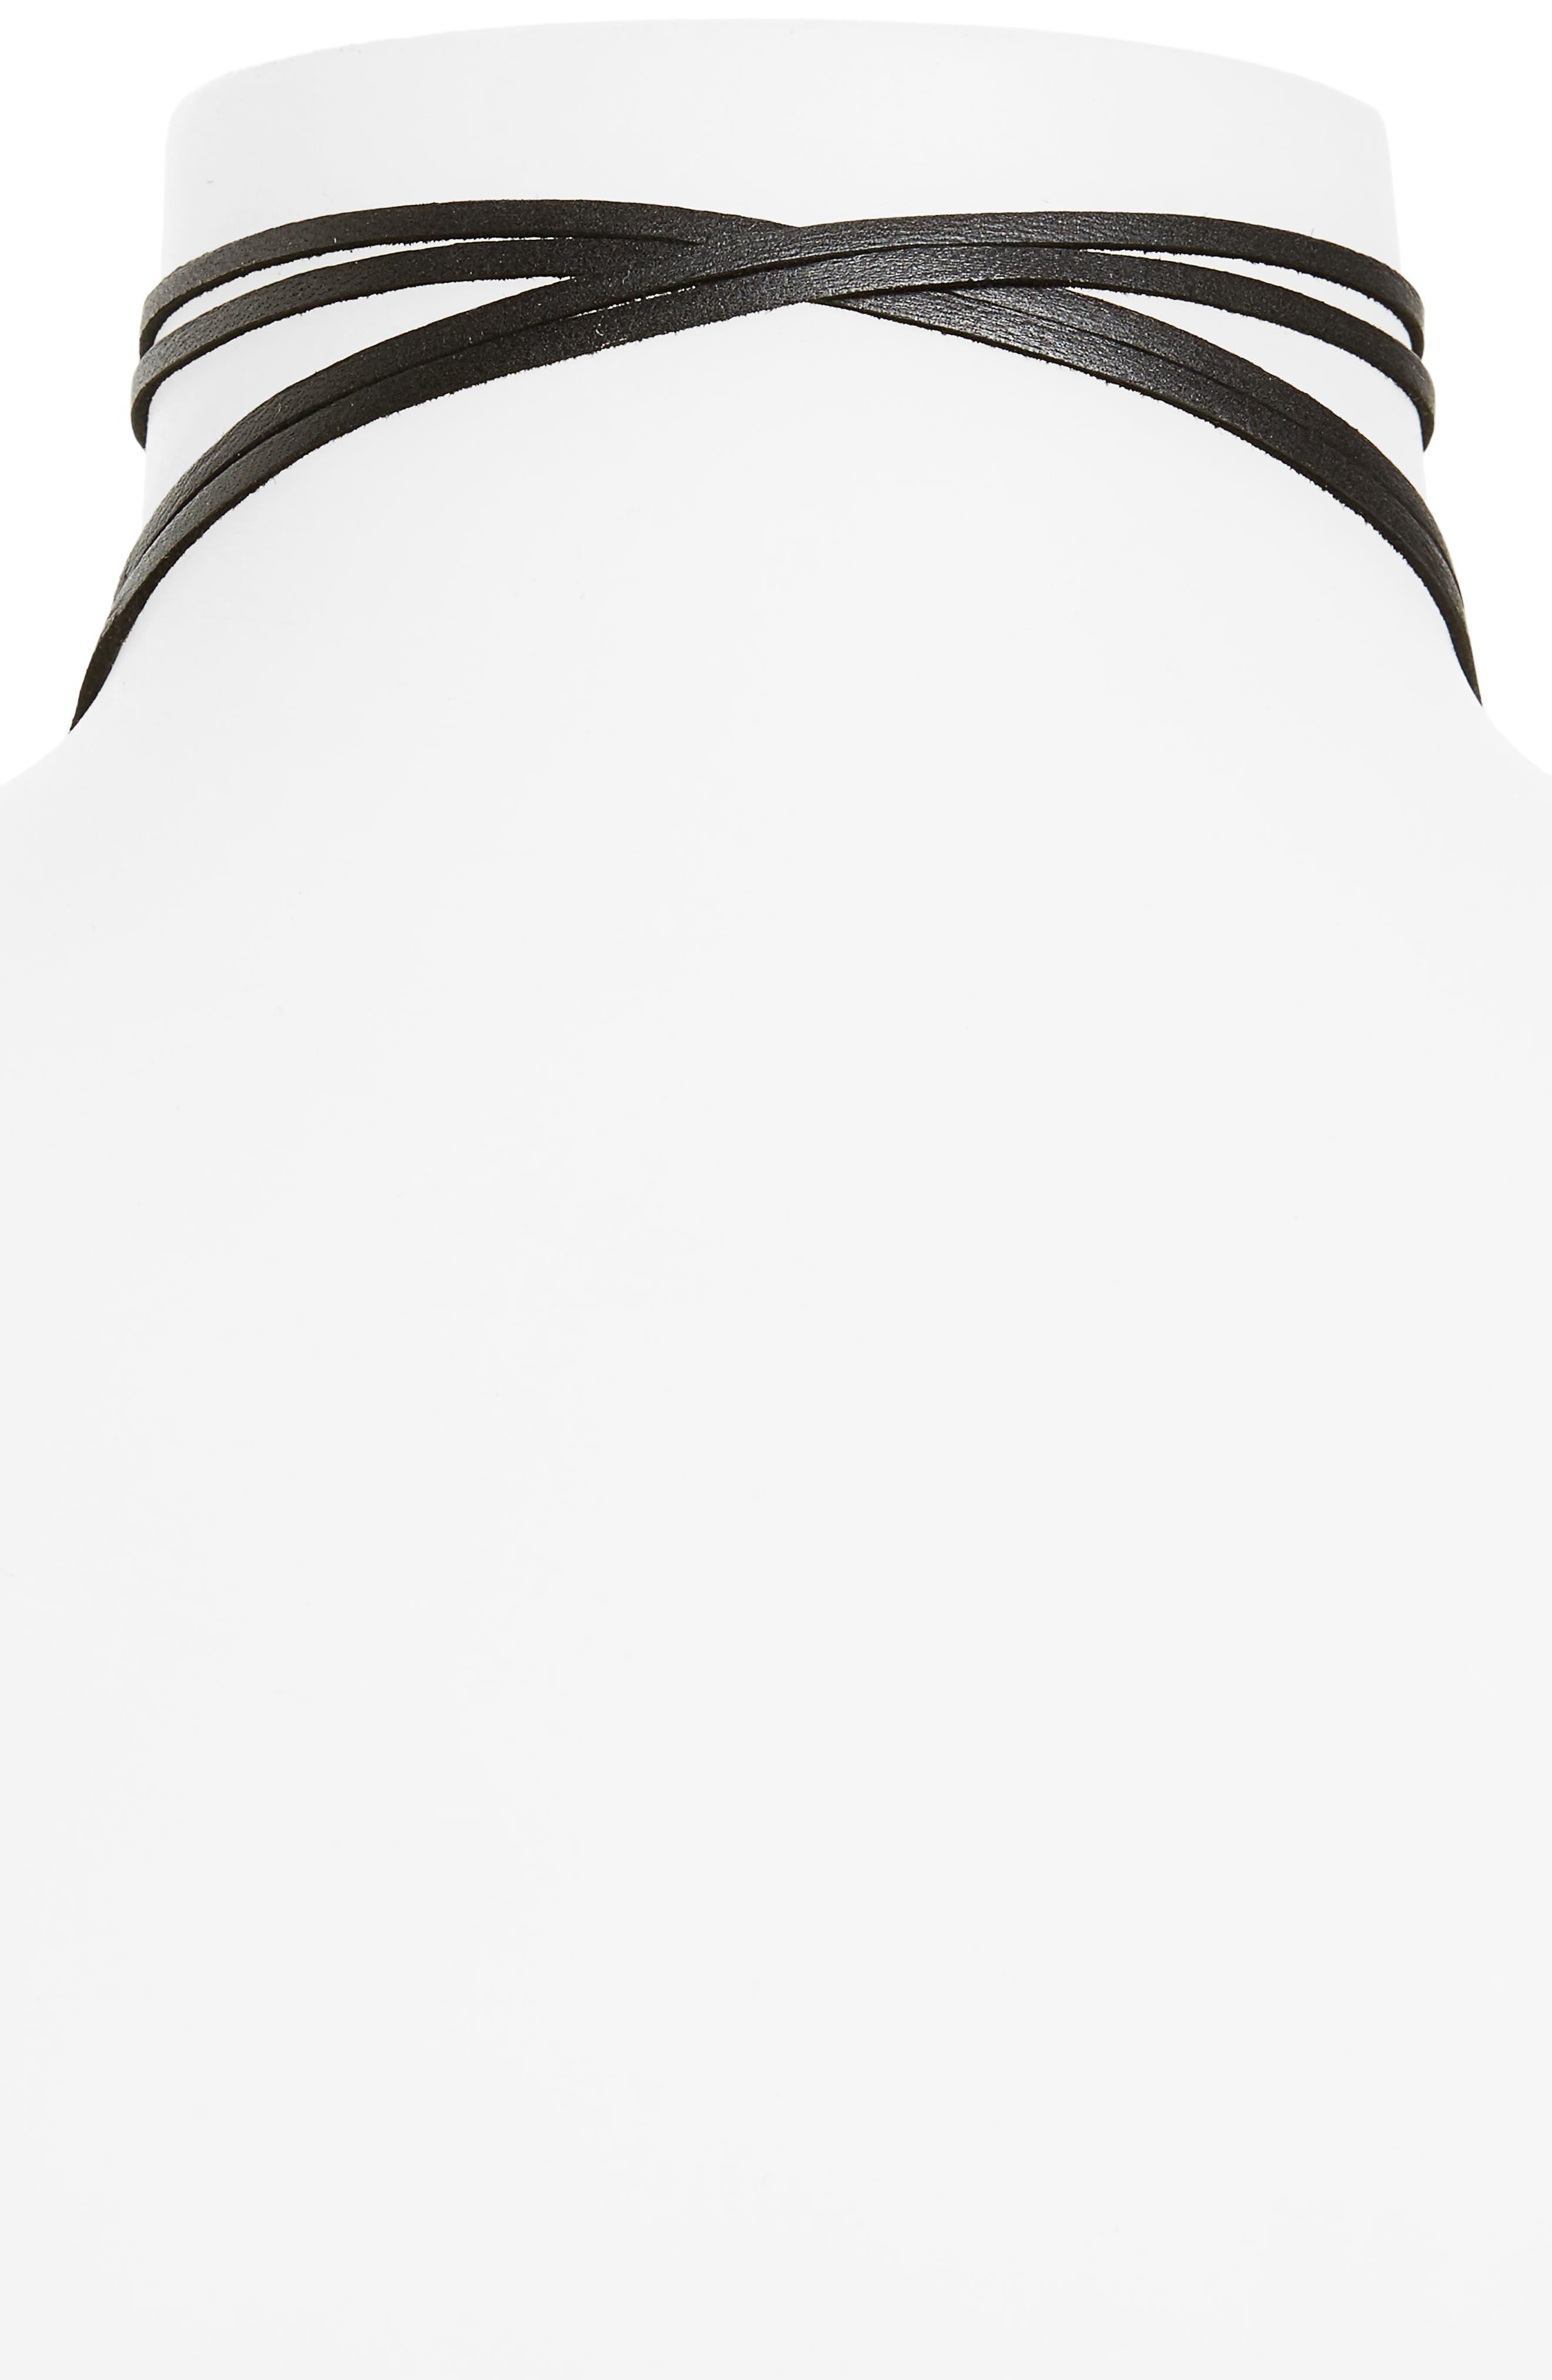 Double Strand Leather Wrap Necklace,                             Alternate thumbnail 2, color,                             040